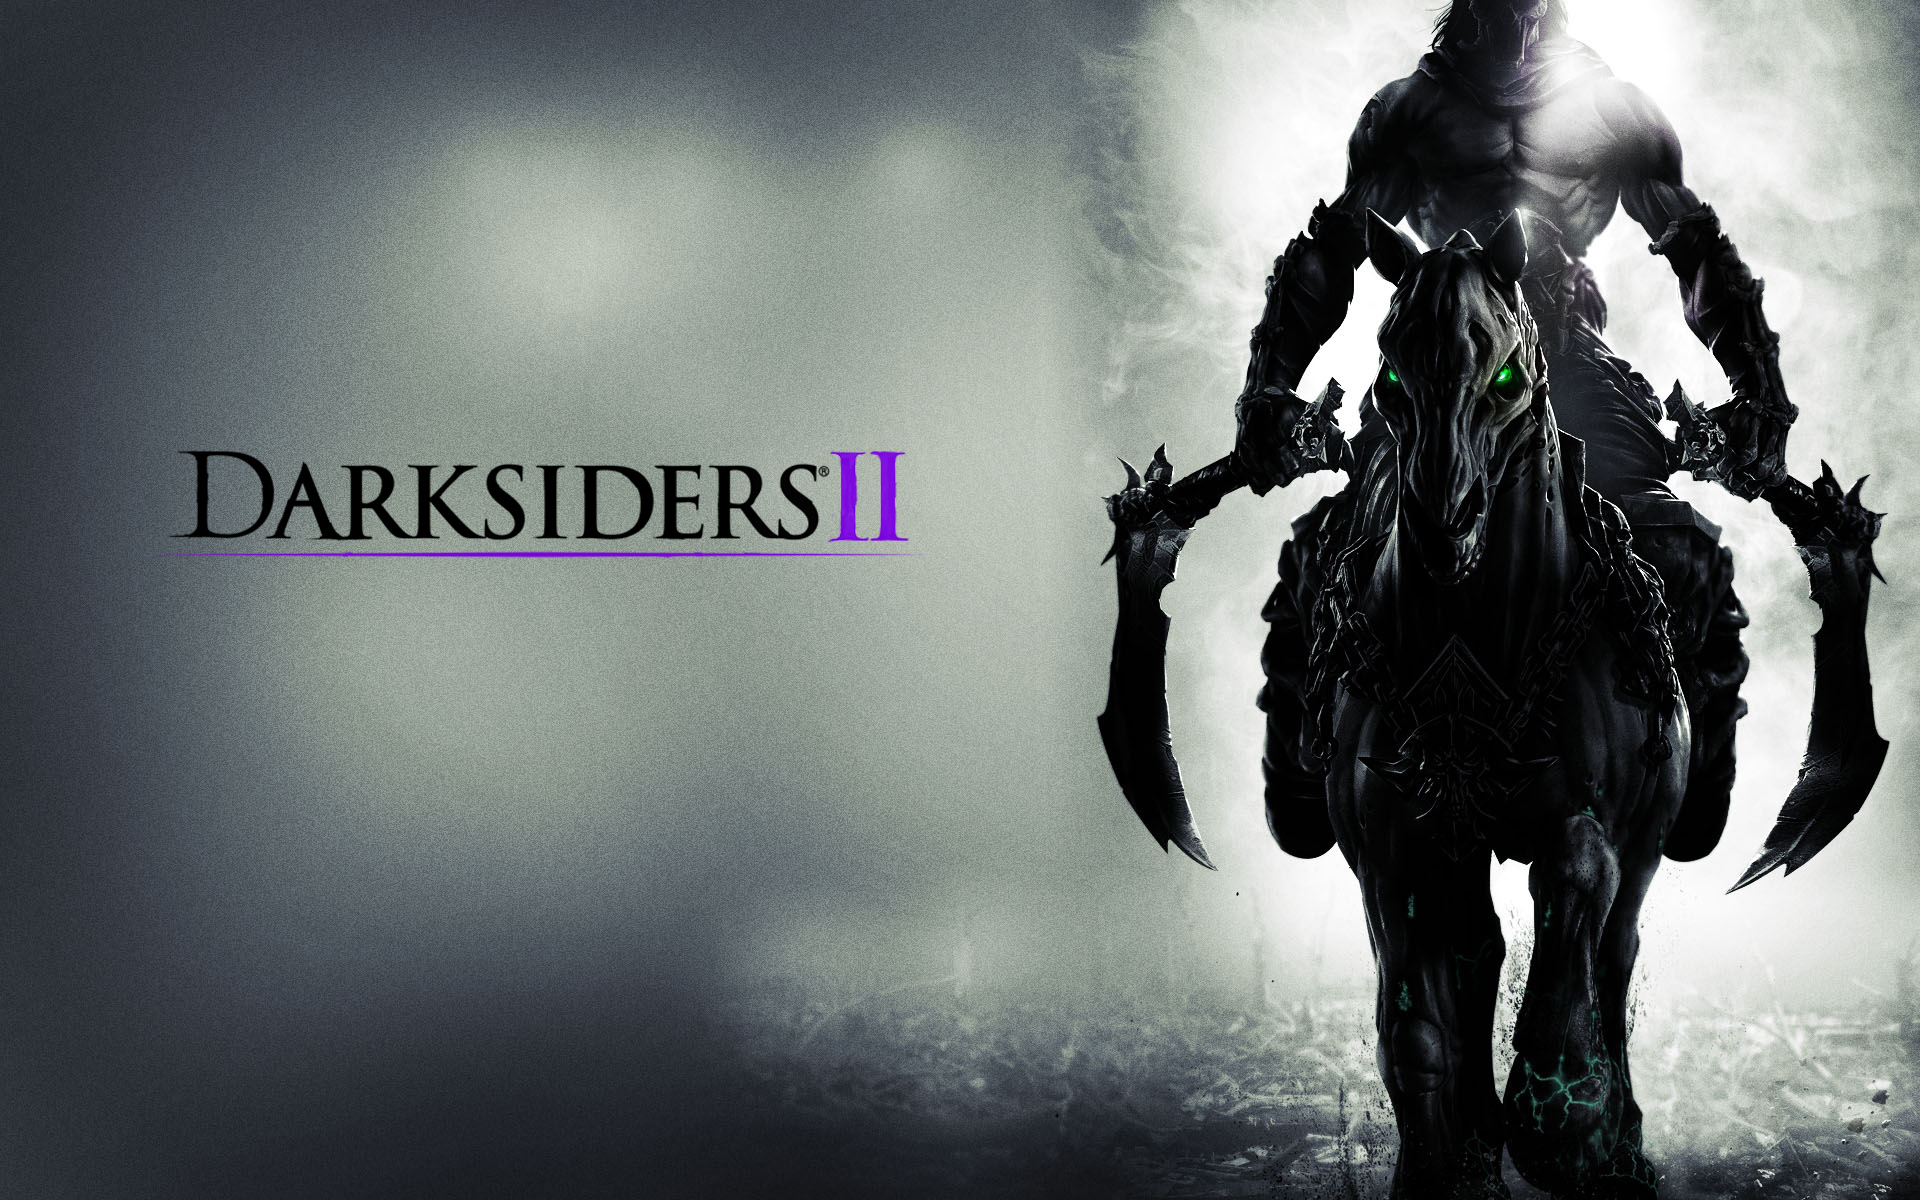 darksiders_2_2012-wide